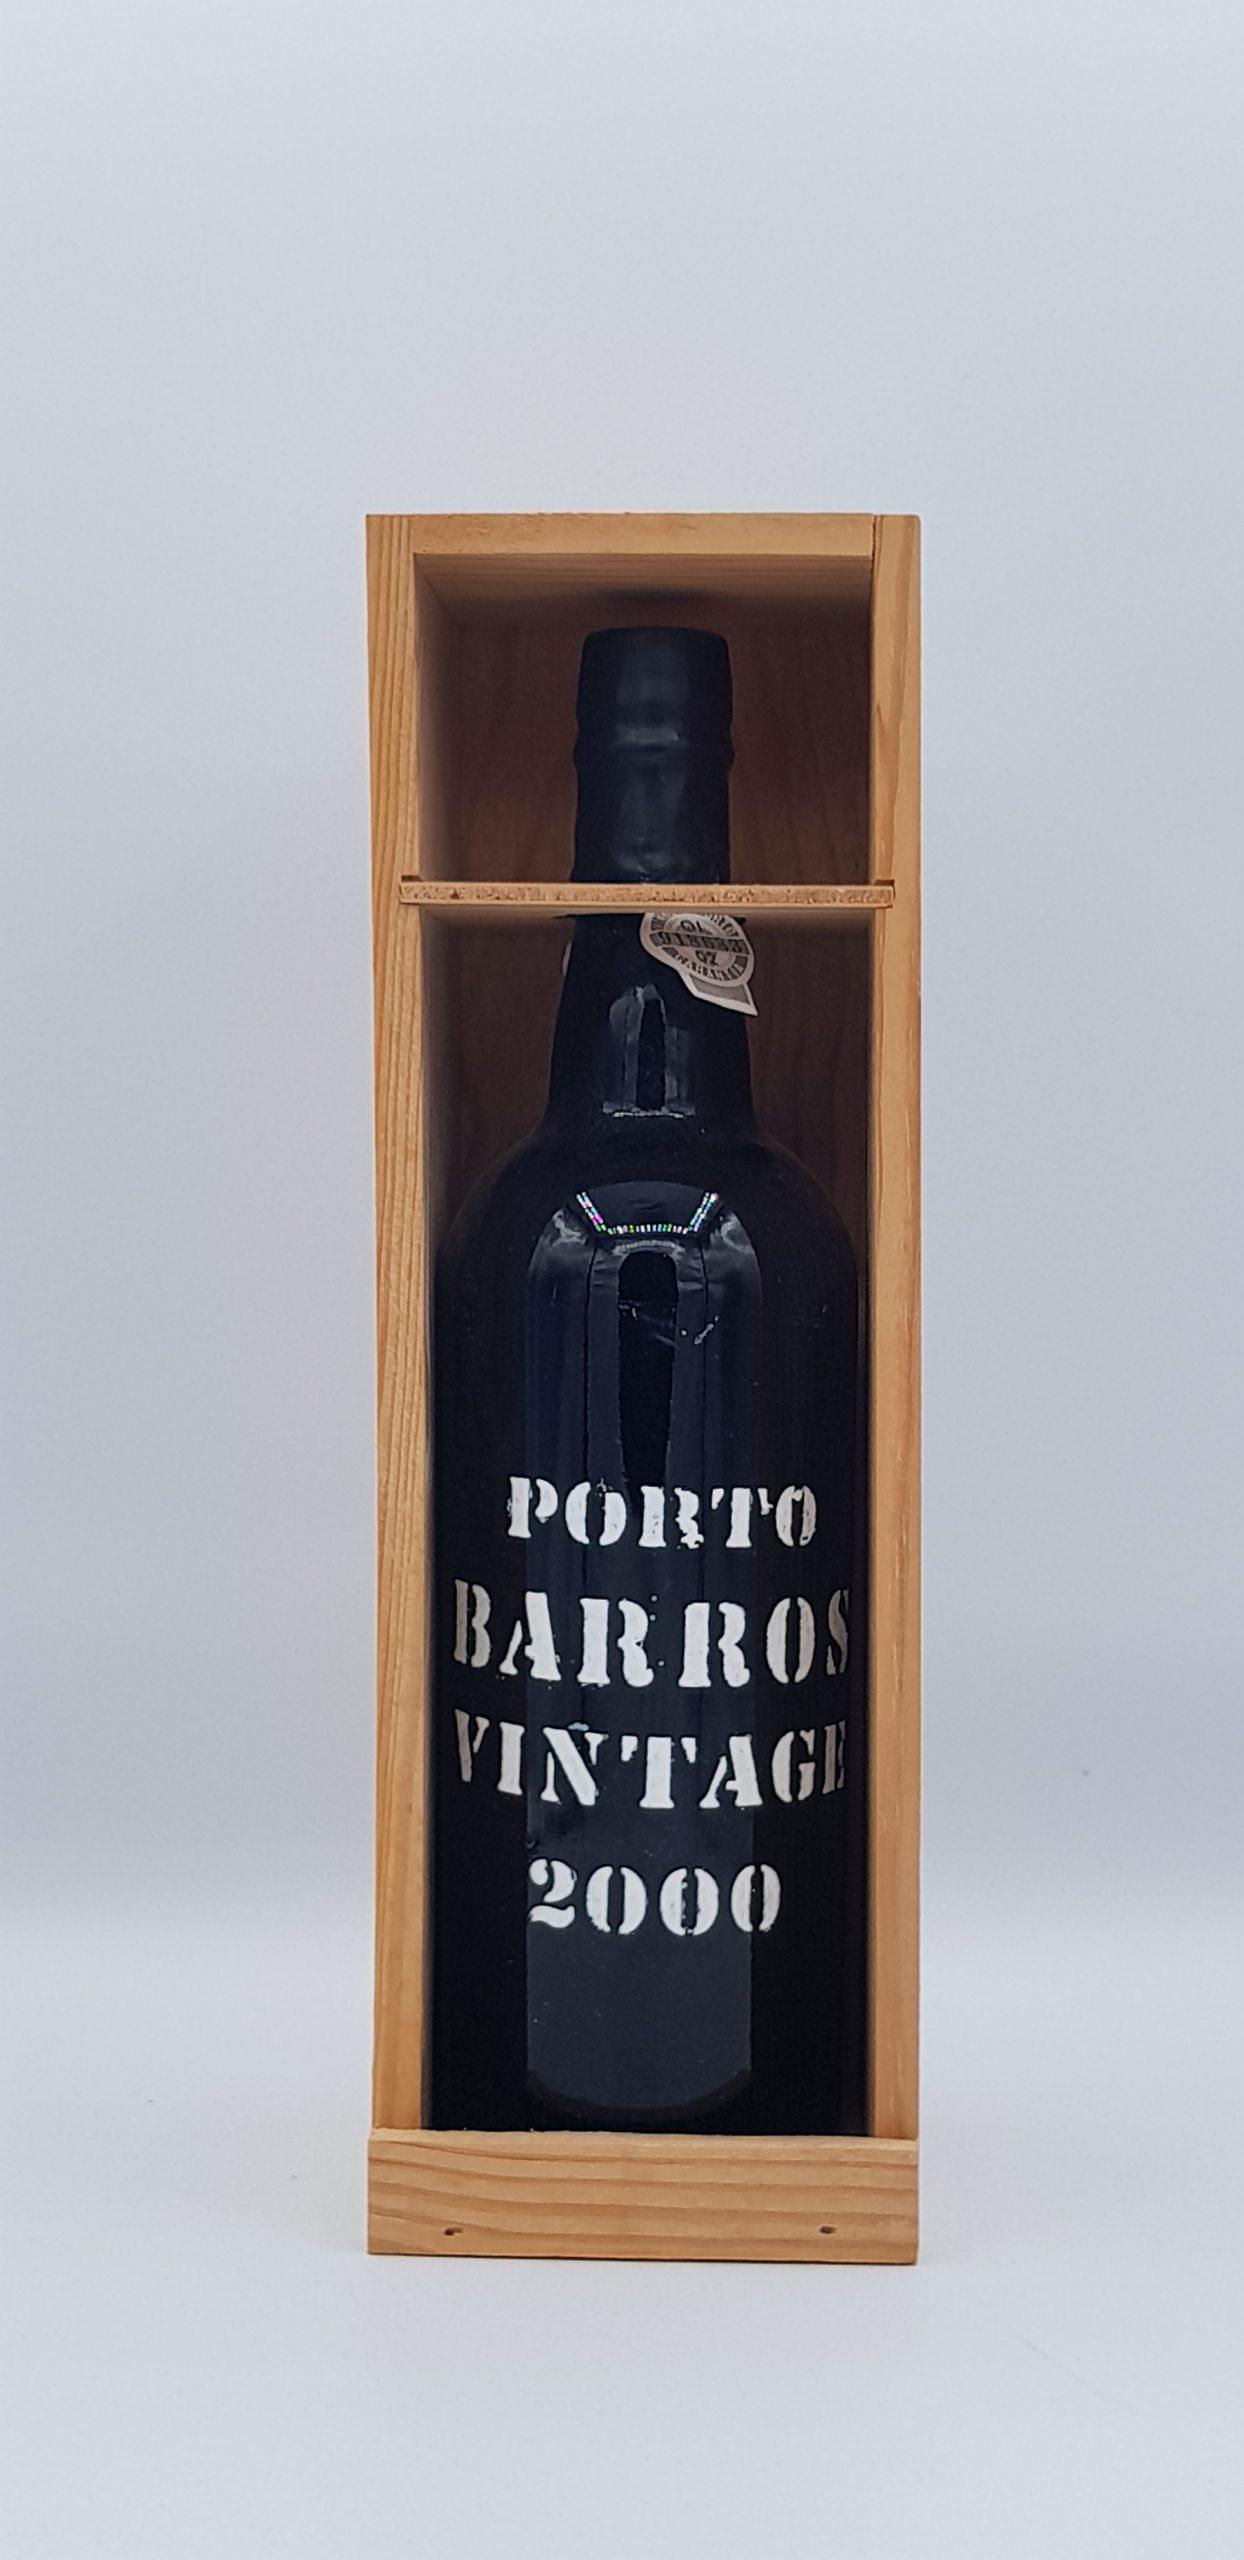 Porto Barros Vintage 2000